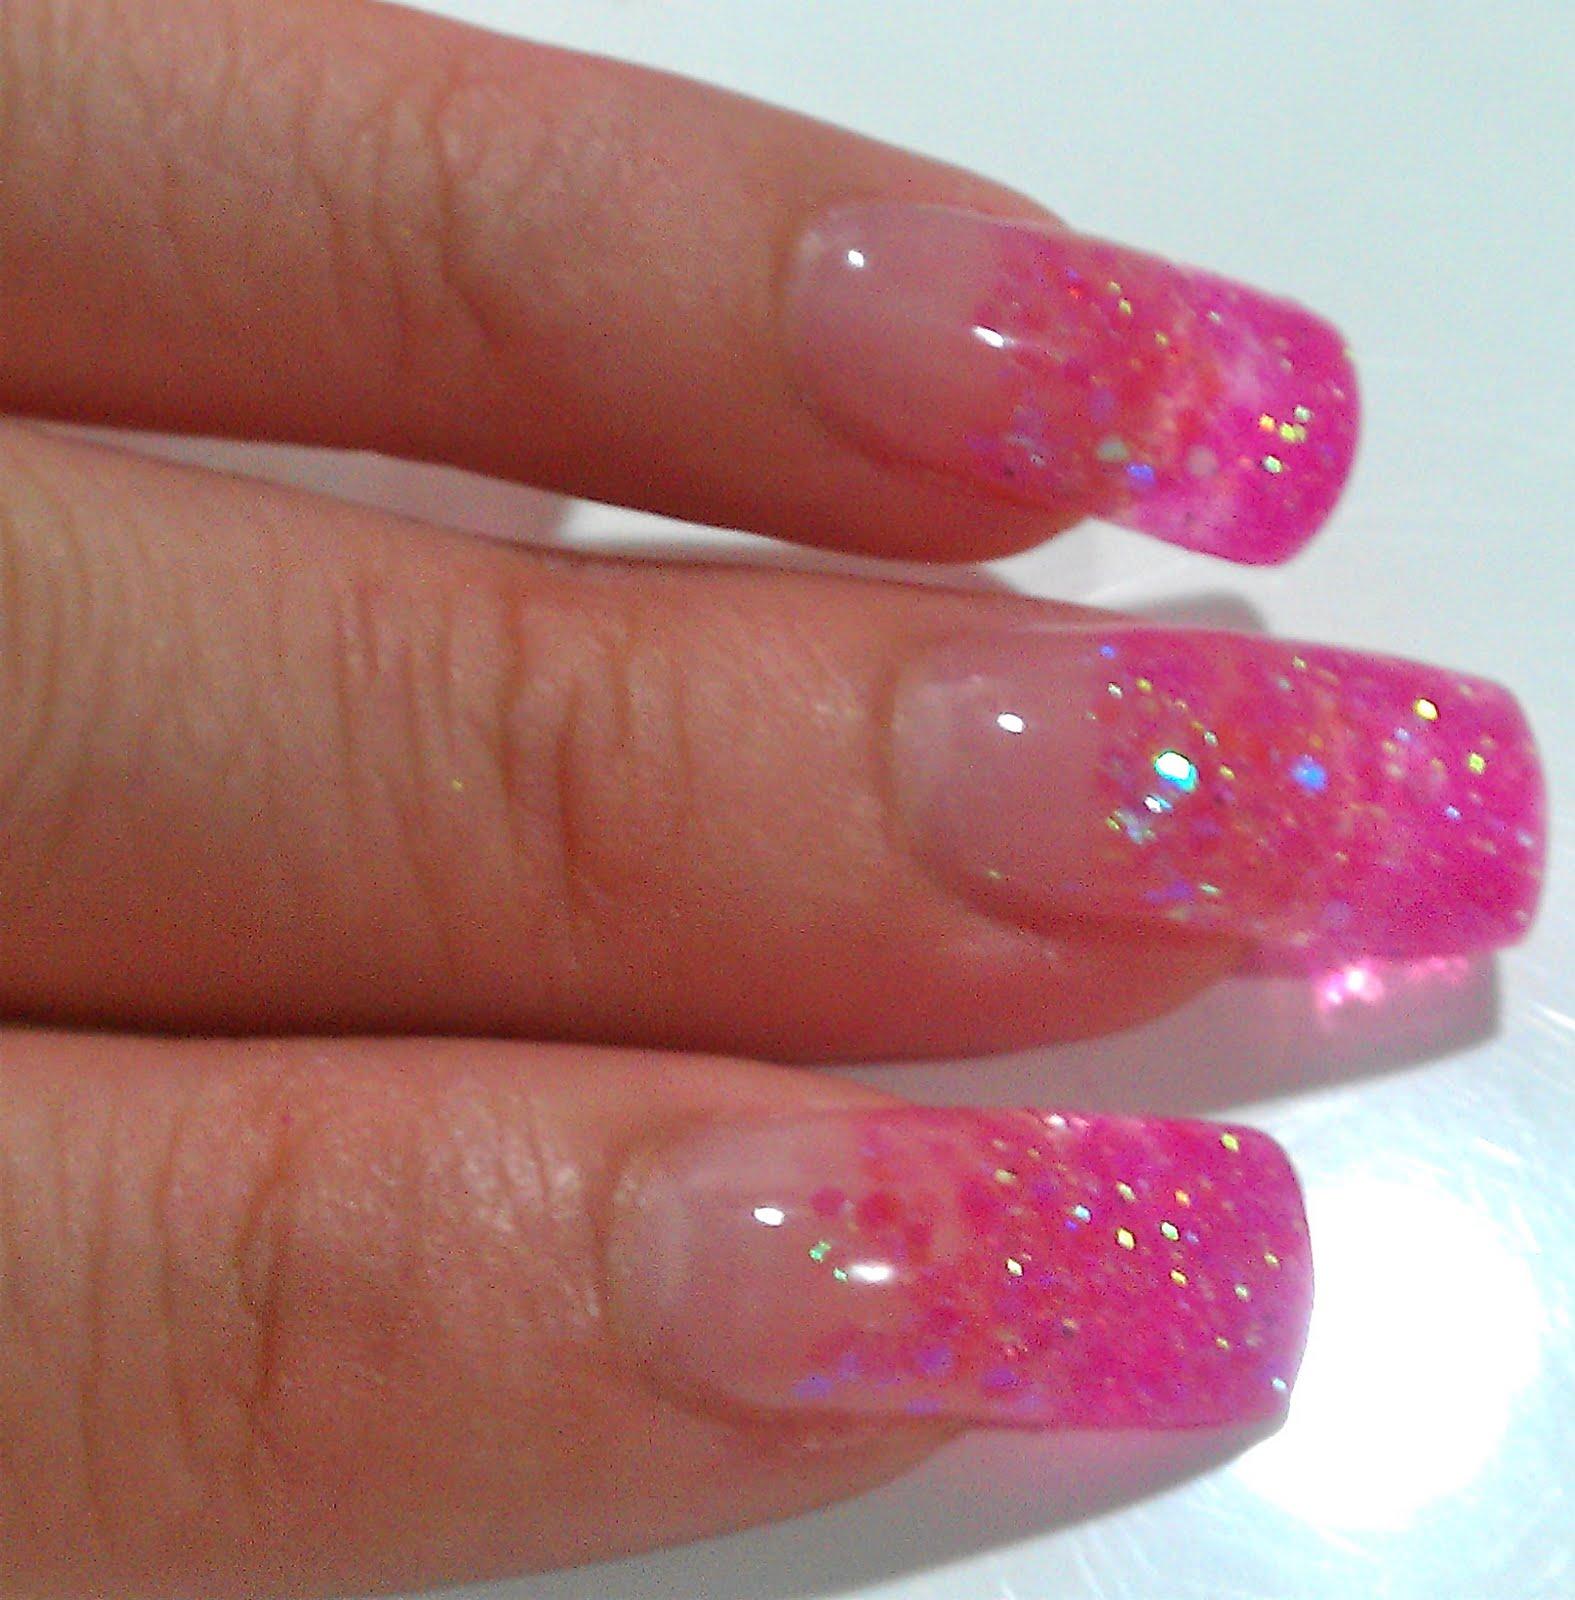 The Clover Beauty Inn: NOTD: Pink Glitter Gel Nails